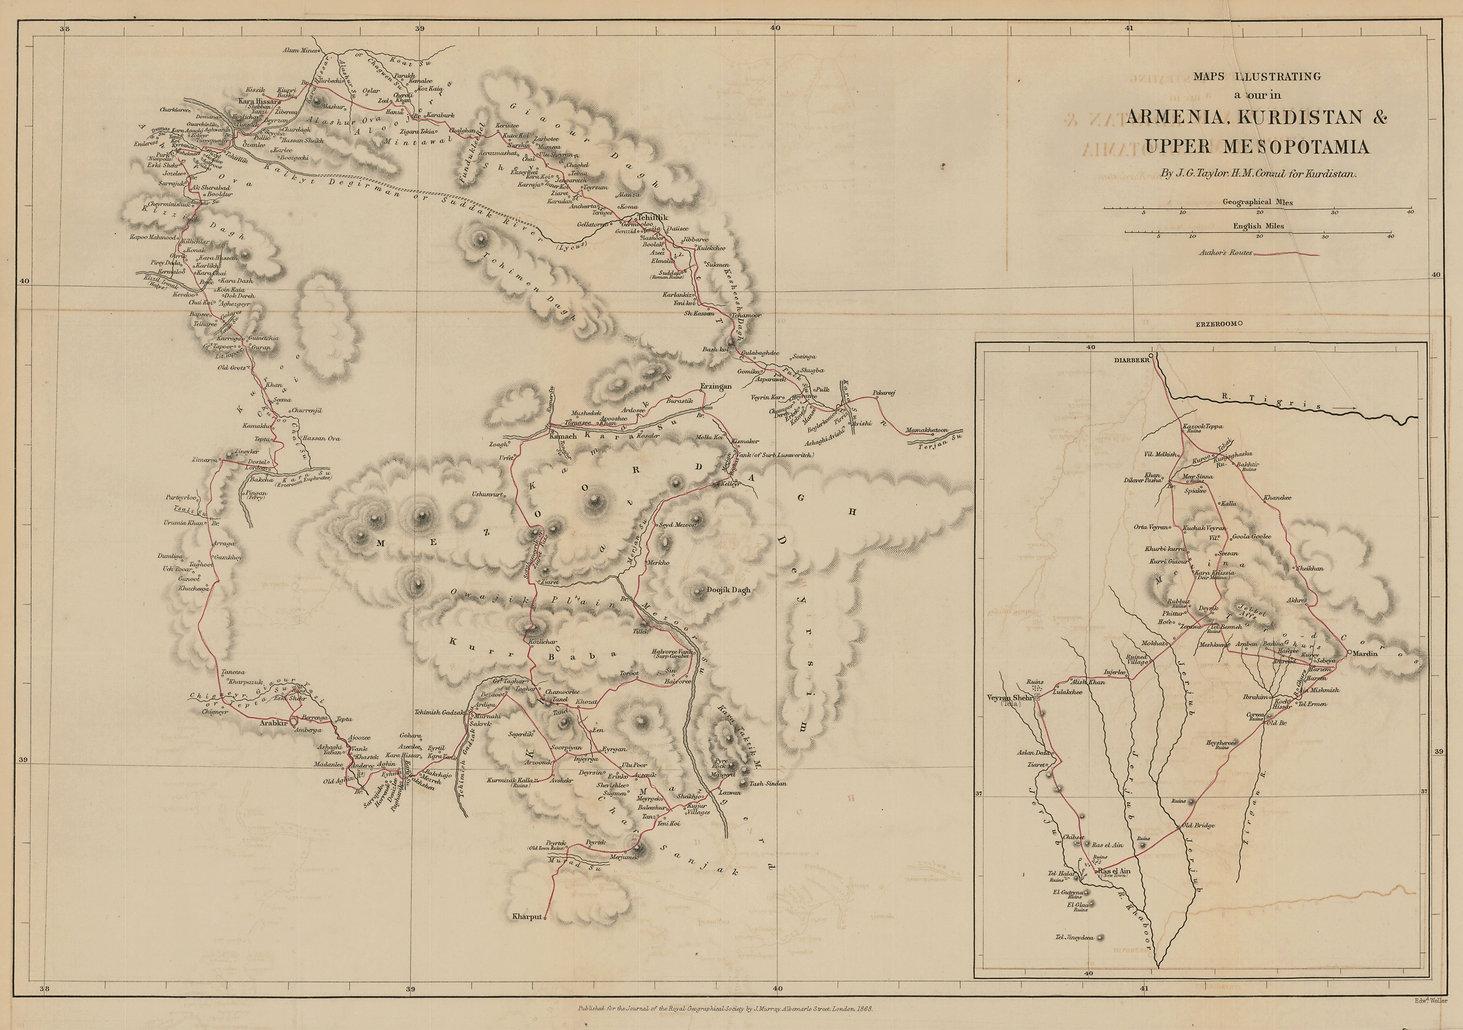 Dersim Map by Taylor.jpg